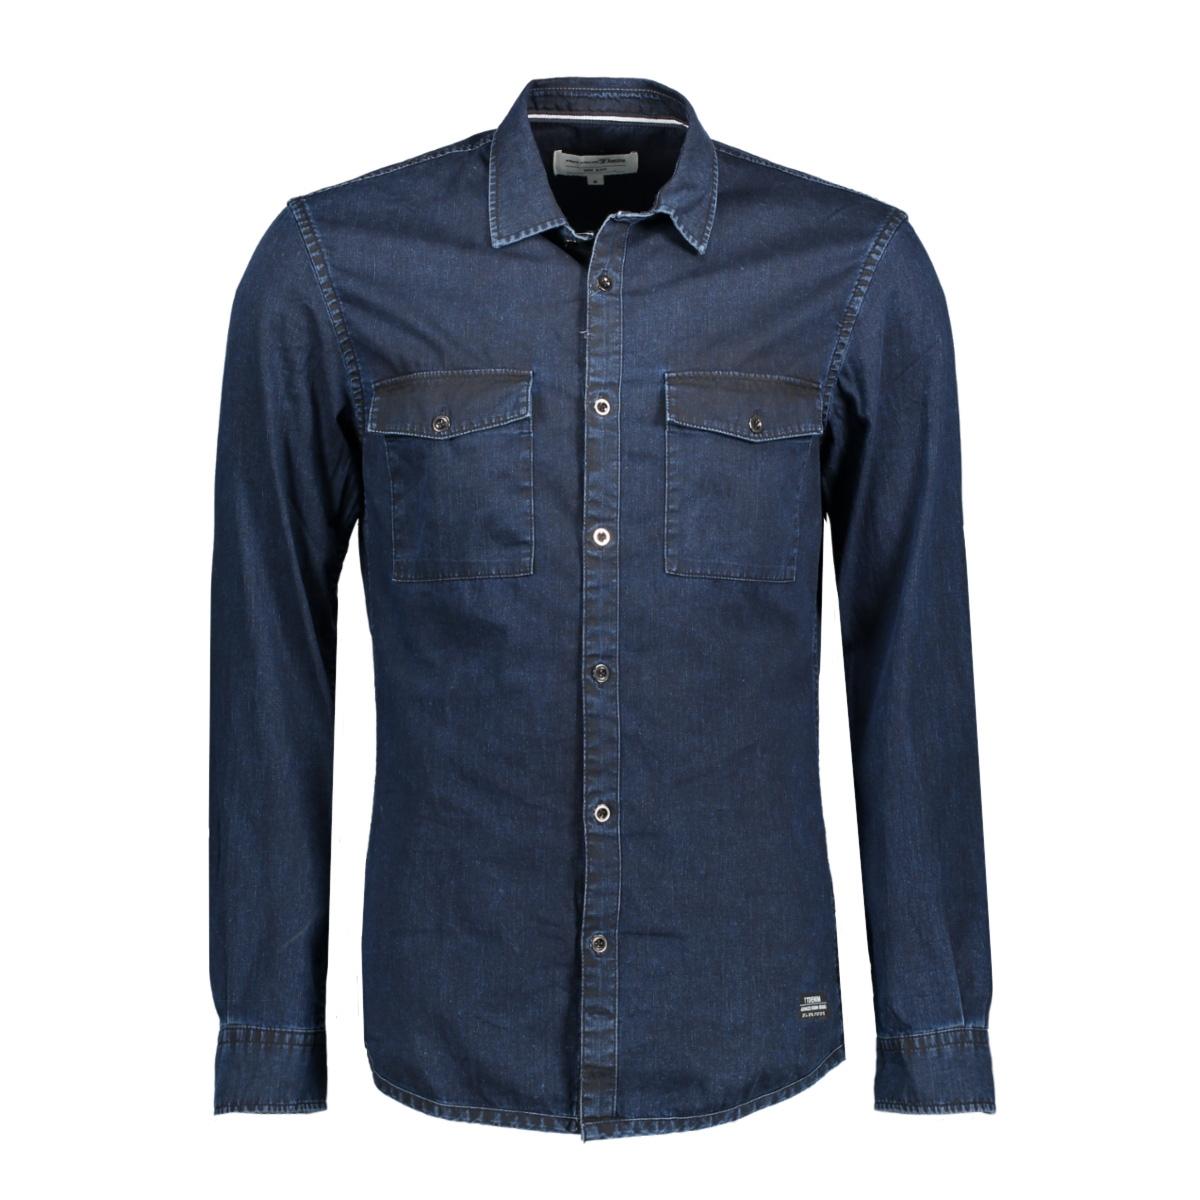 2055118.00.12 tom tailor overhemd 1088